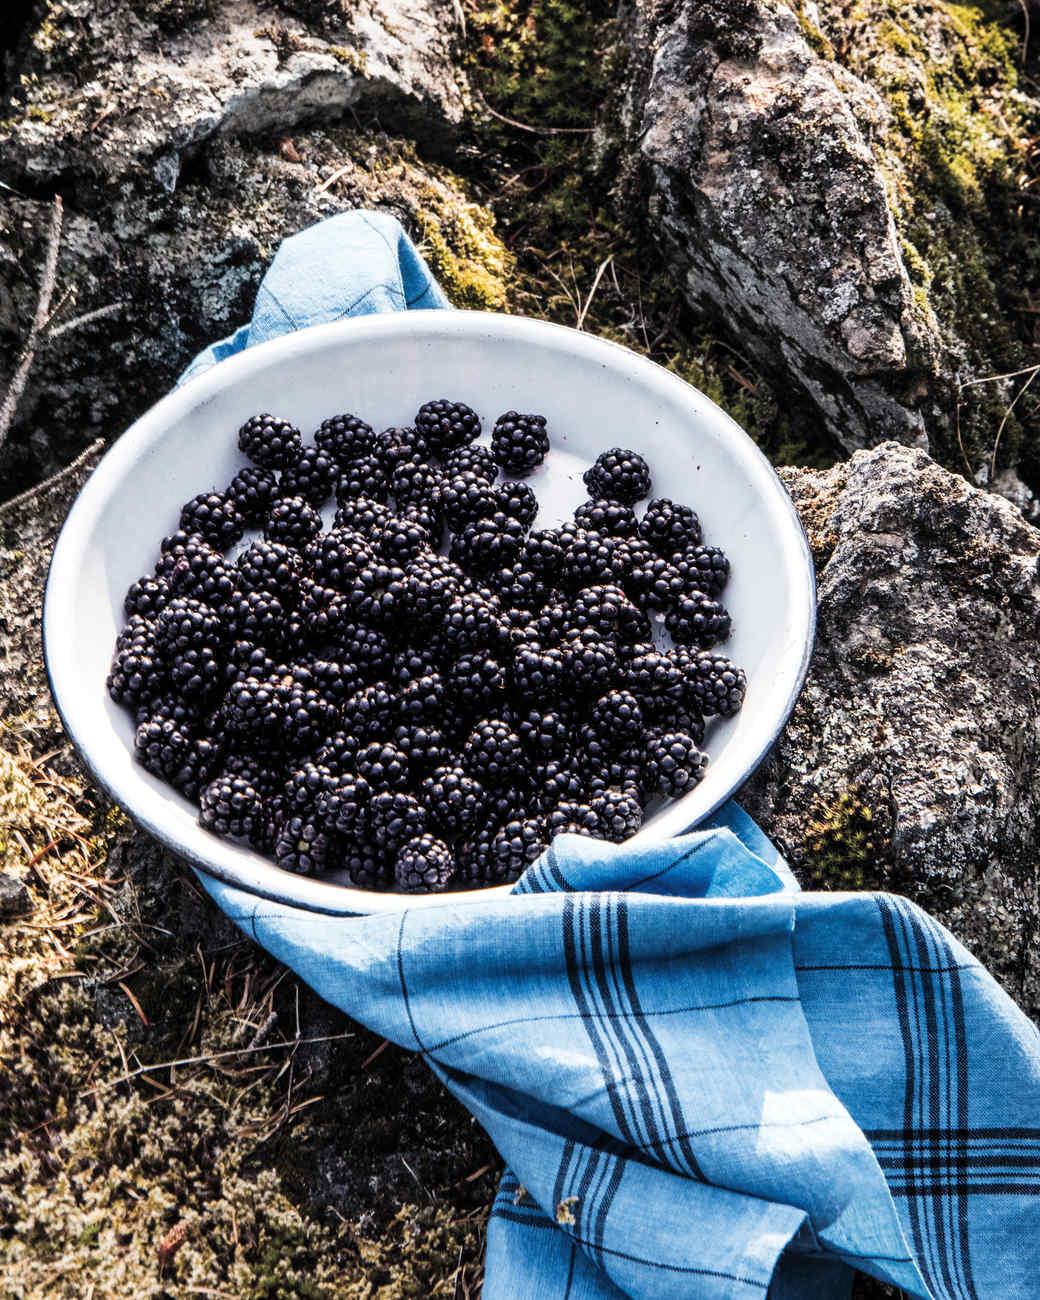 berry-picking-29-d111488.jpg